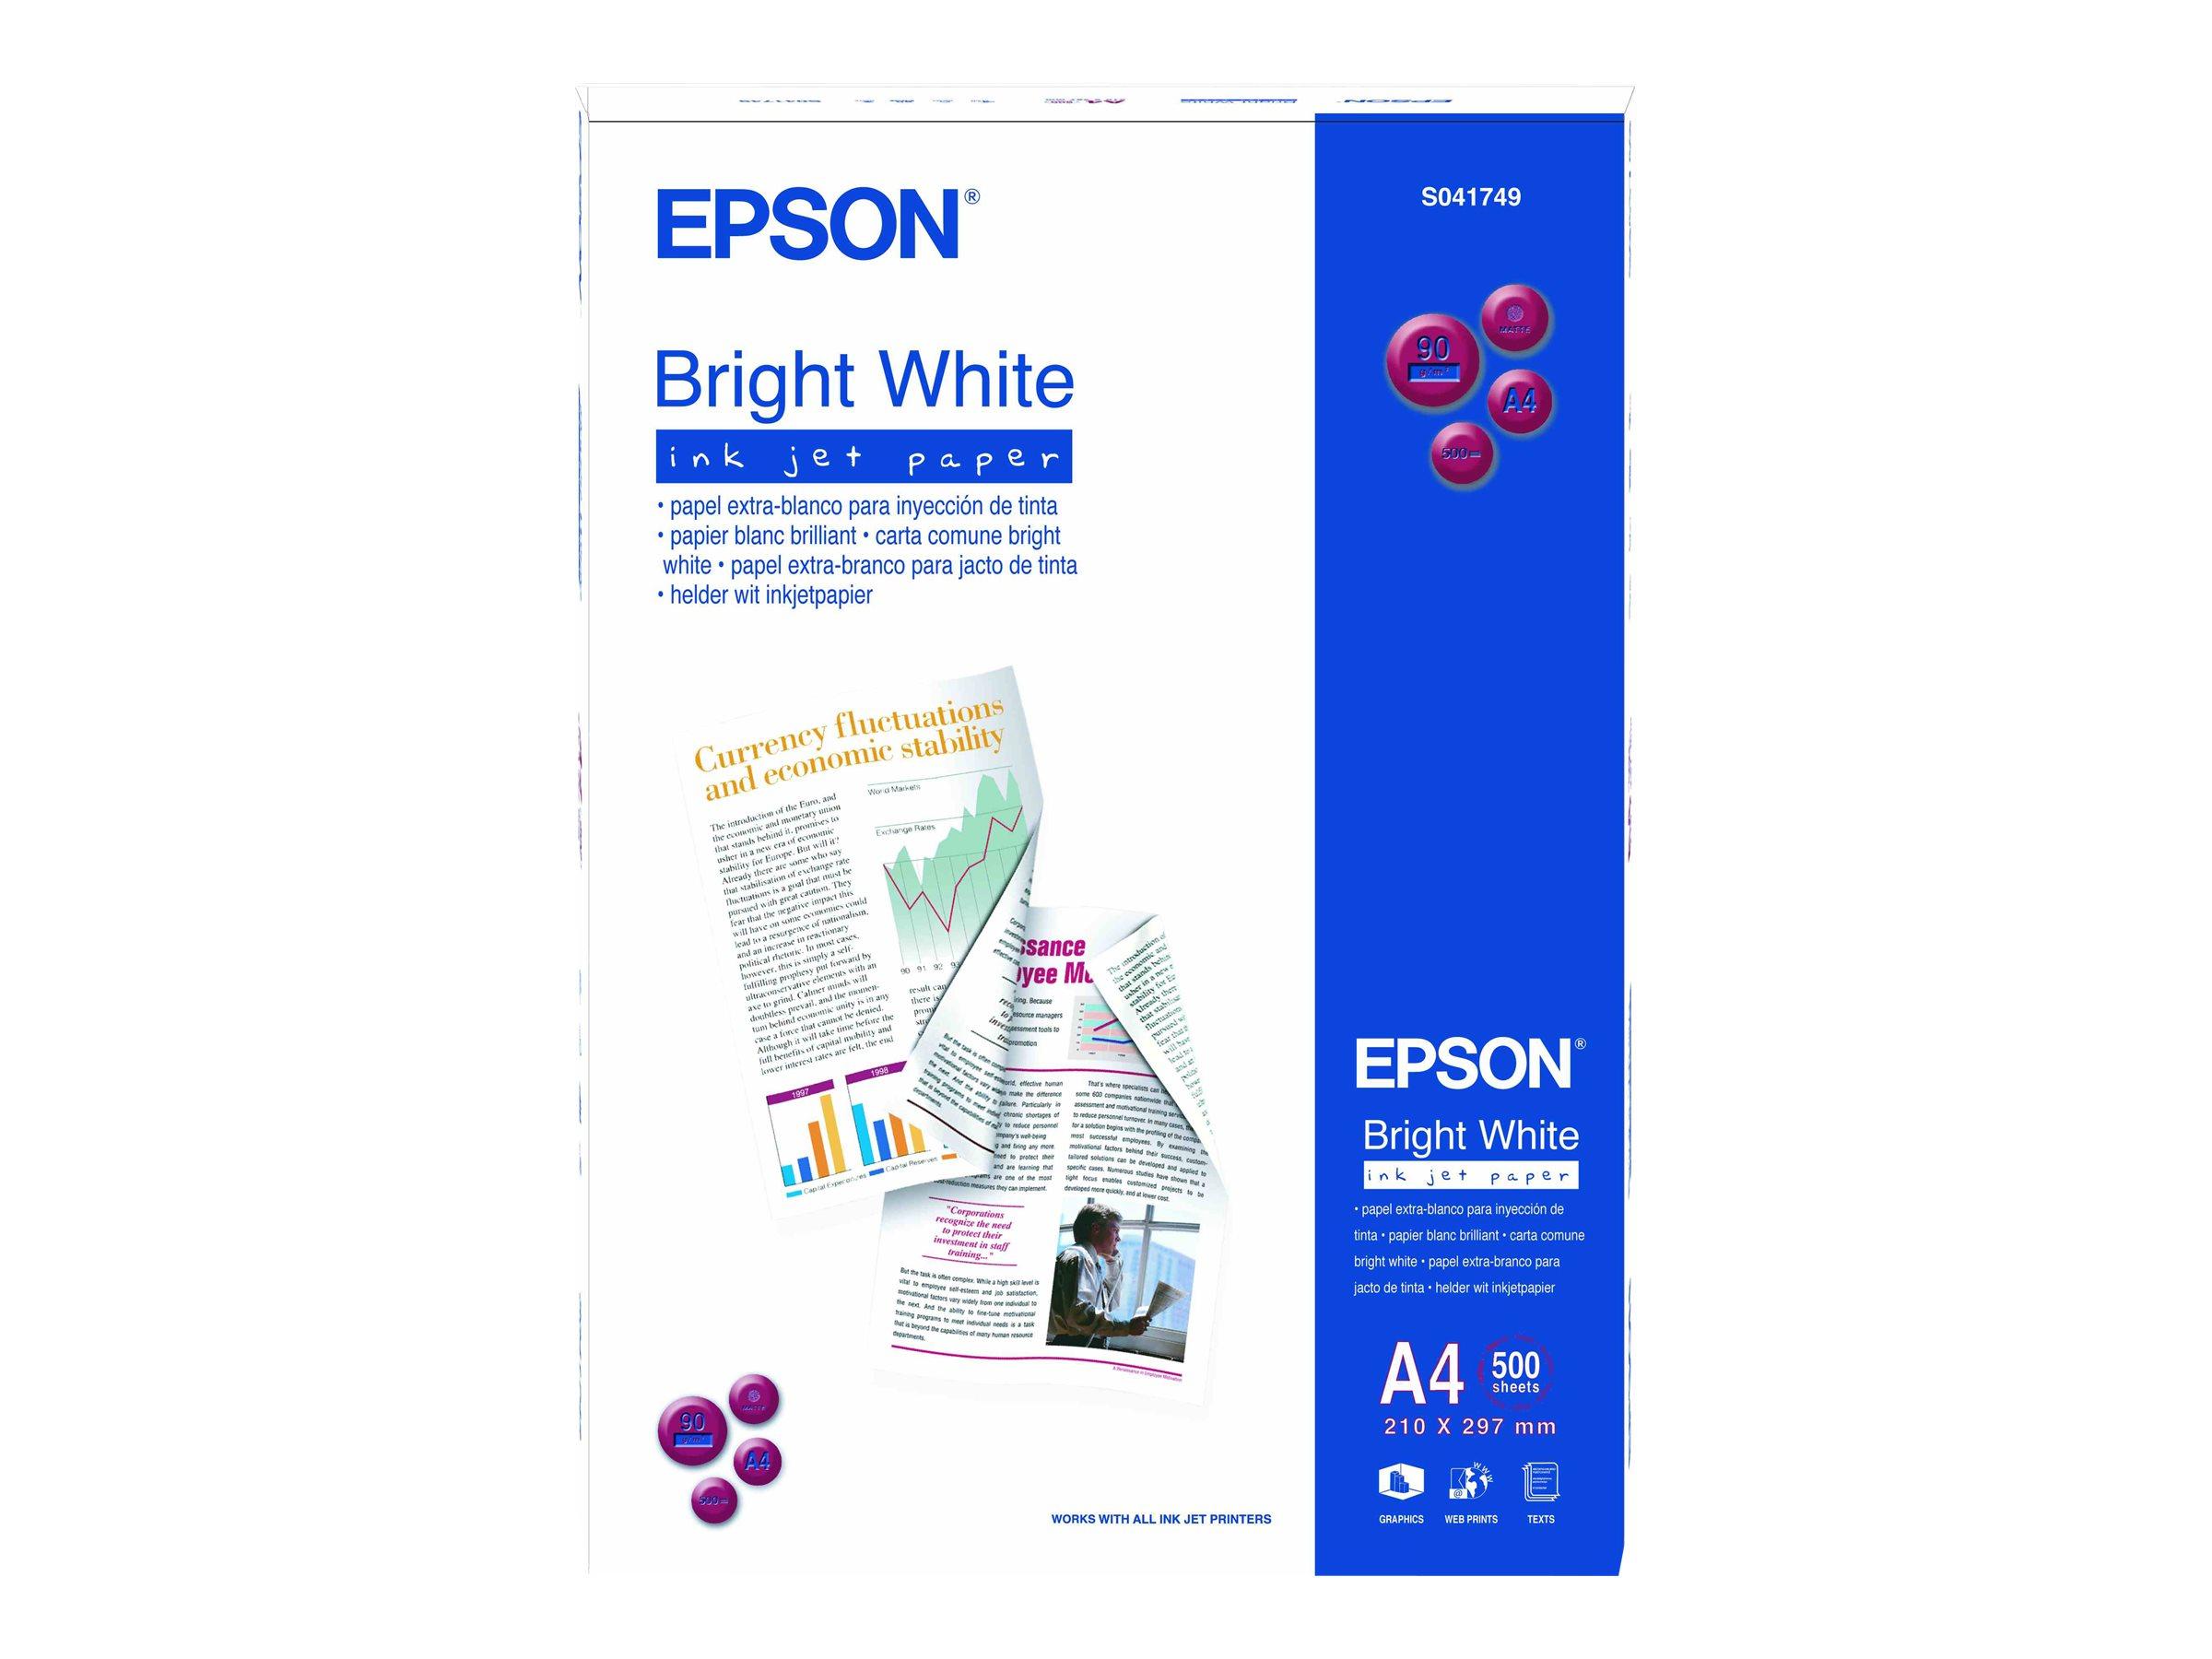 Epson Bright White - A4 (210 x 297 mm)